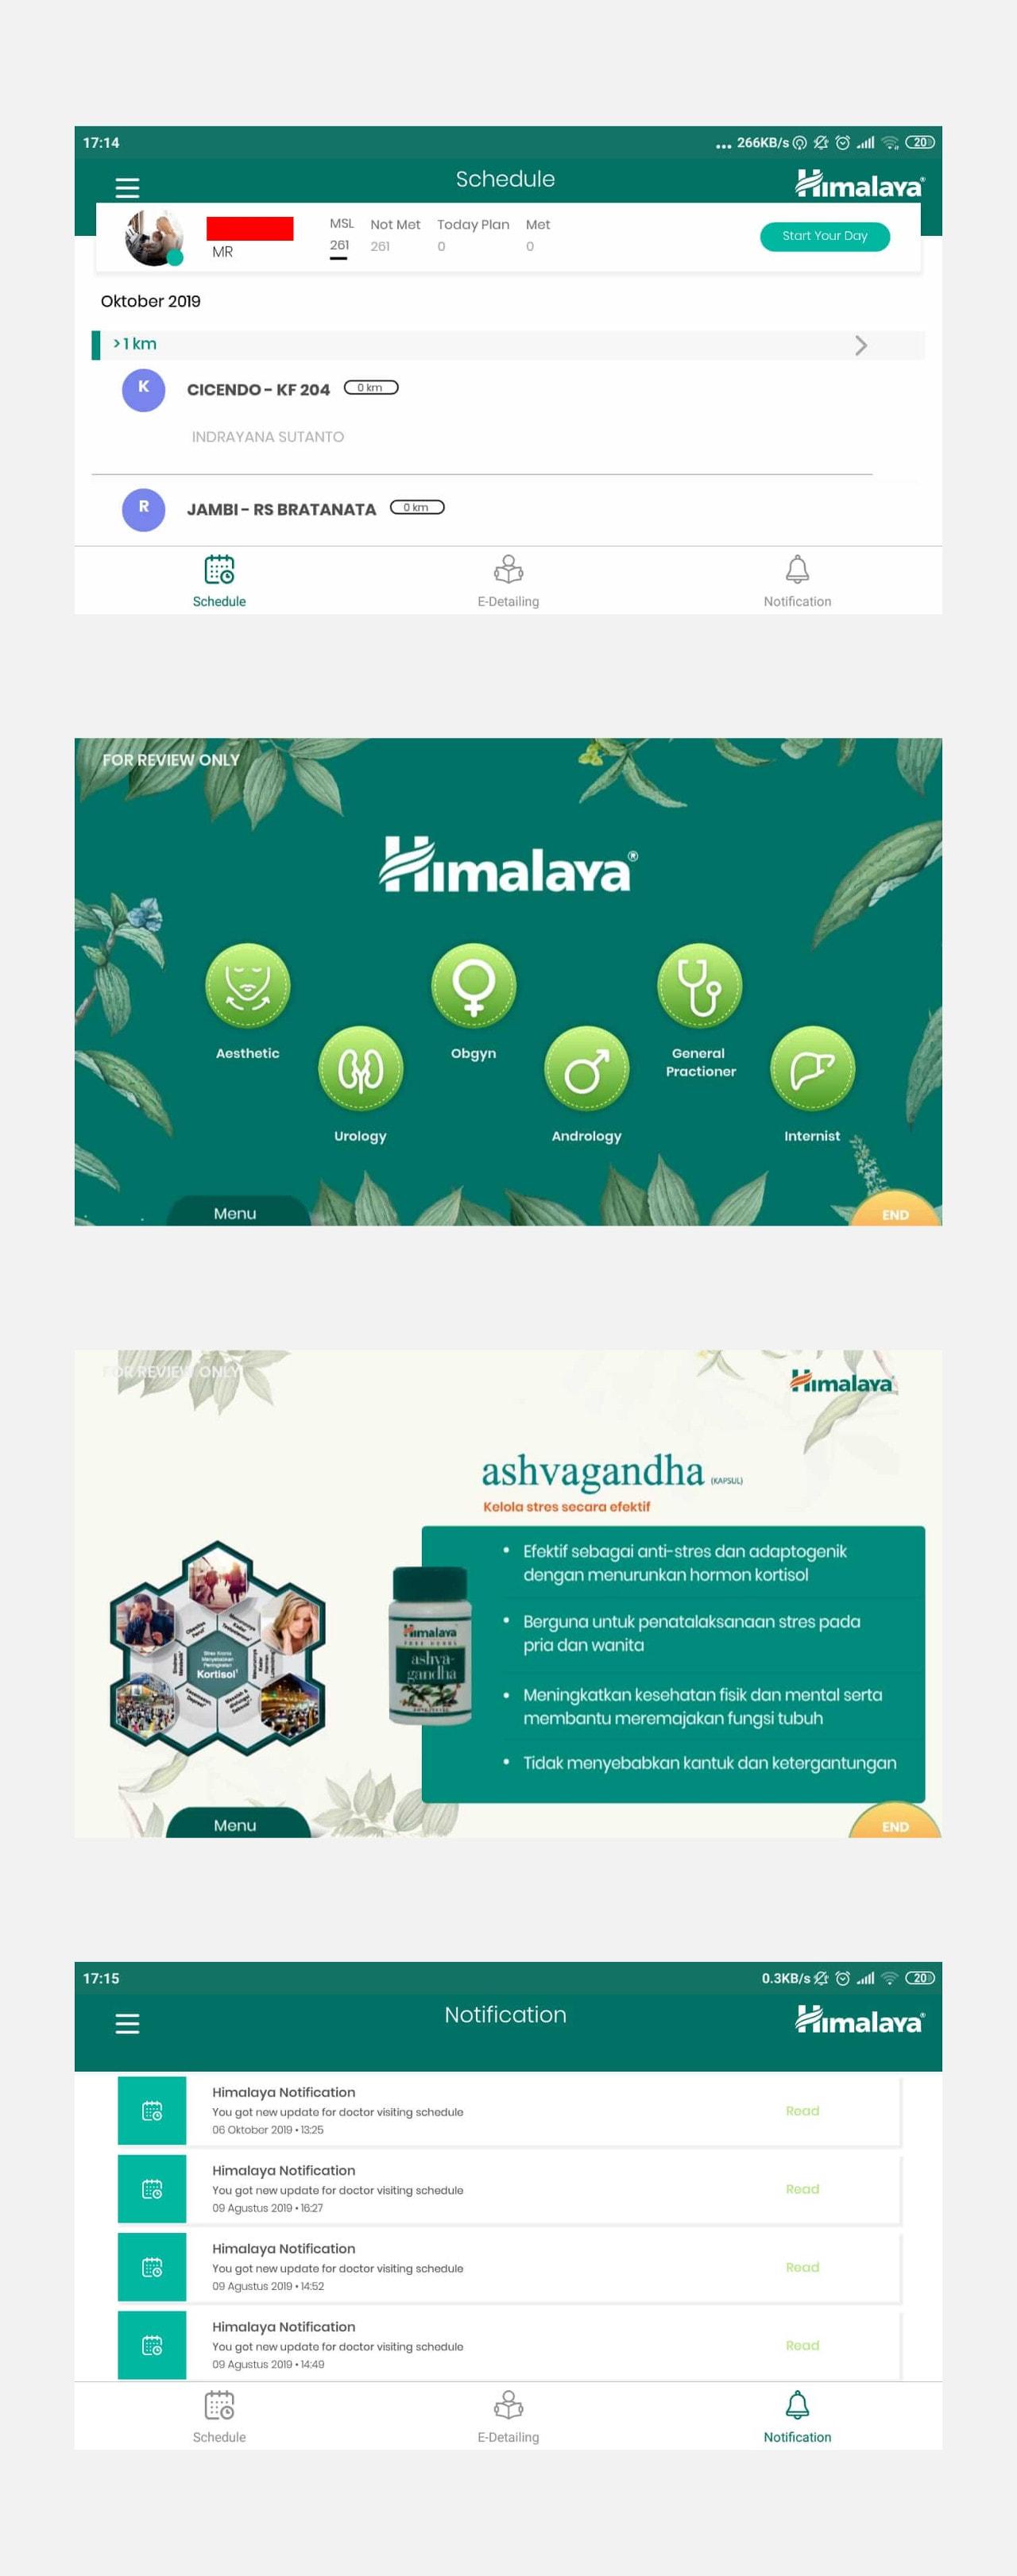 portfolio popout.id web development agency jakarta client Himalaya CRM Dashboard & Mobile App